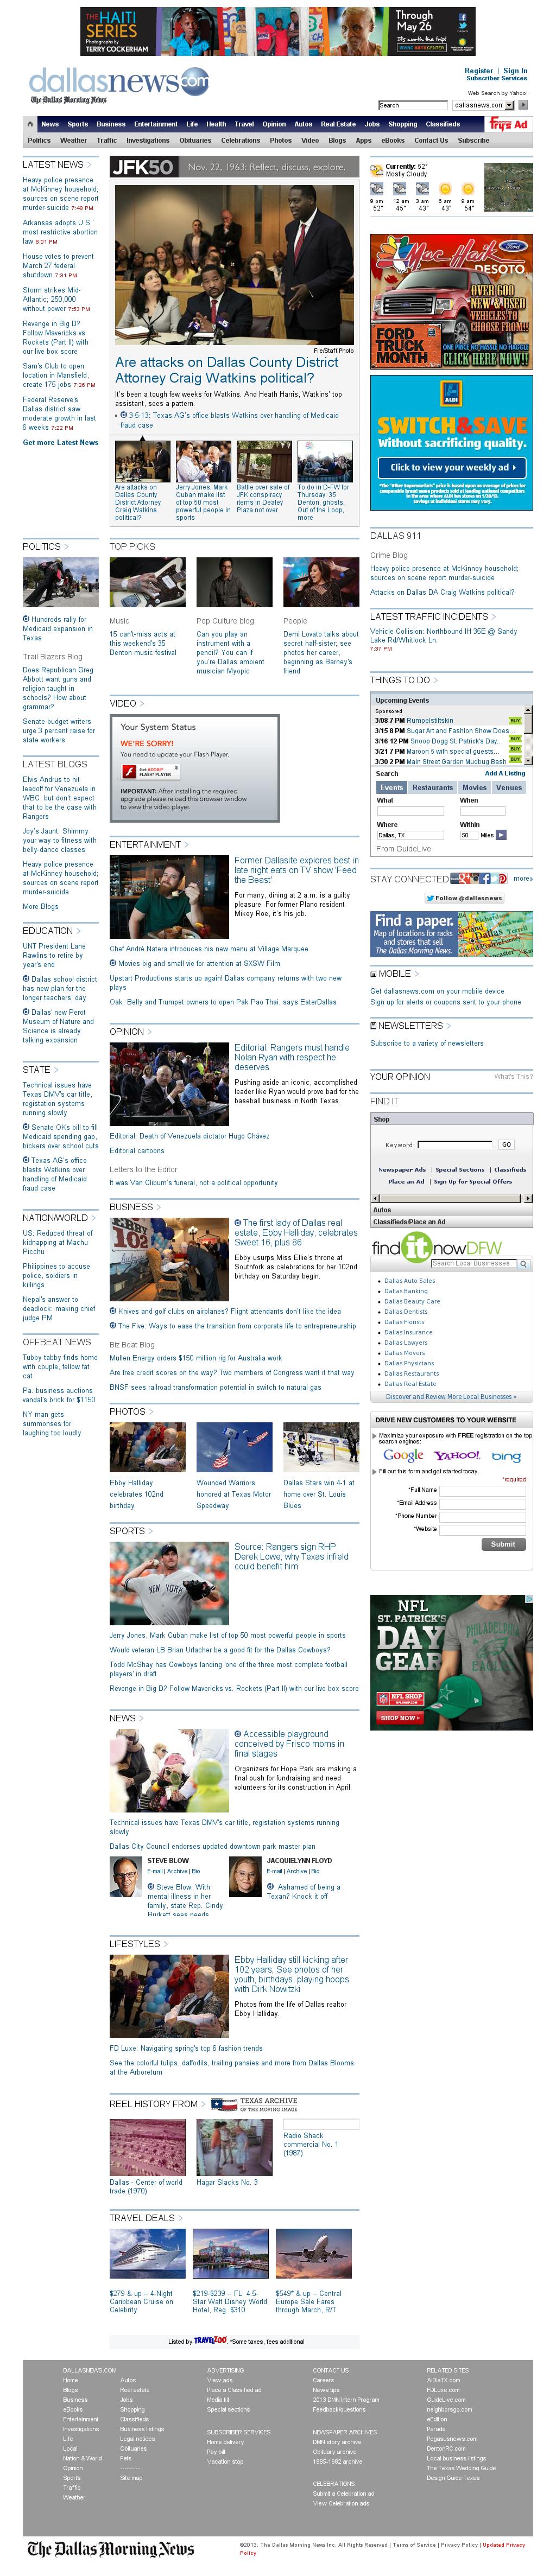 dallasnews.com at Thursday March 7, 2013, 2:03 a.m. UTC